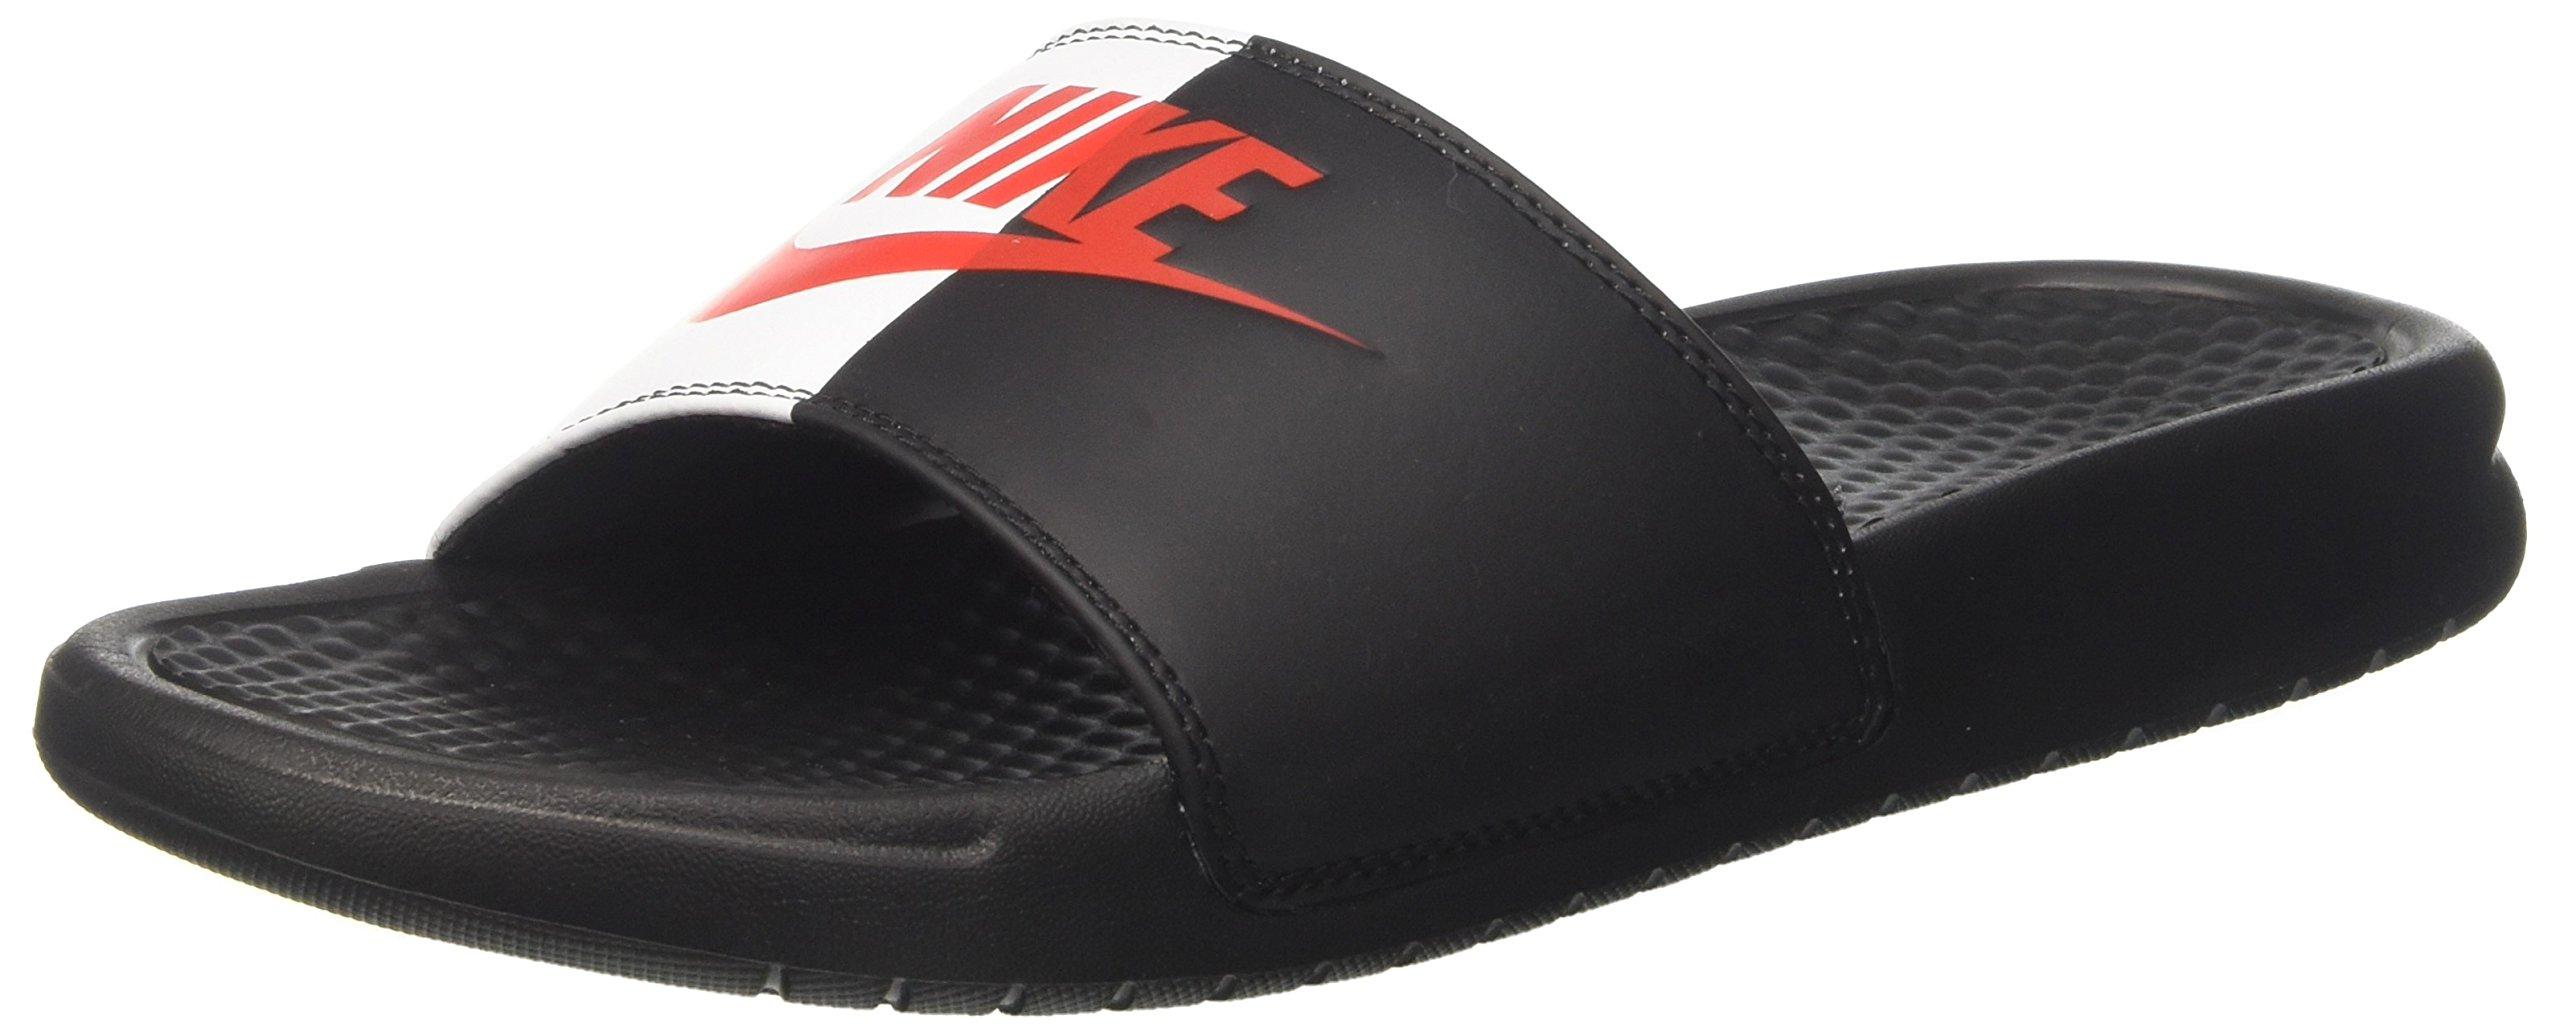 328cb02ad2e1a Galleon - Nike Men s Benassi Just Do It Athletic Sandal